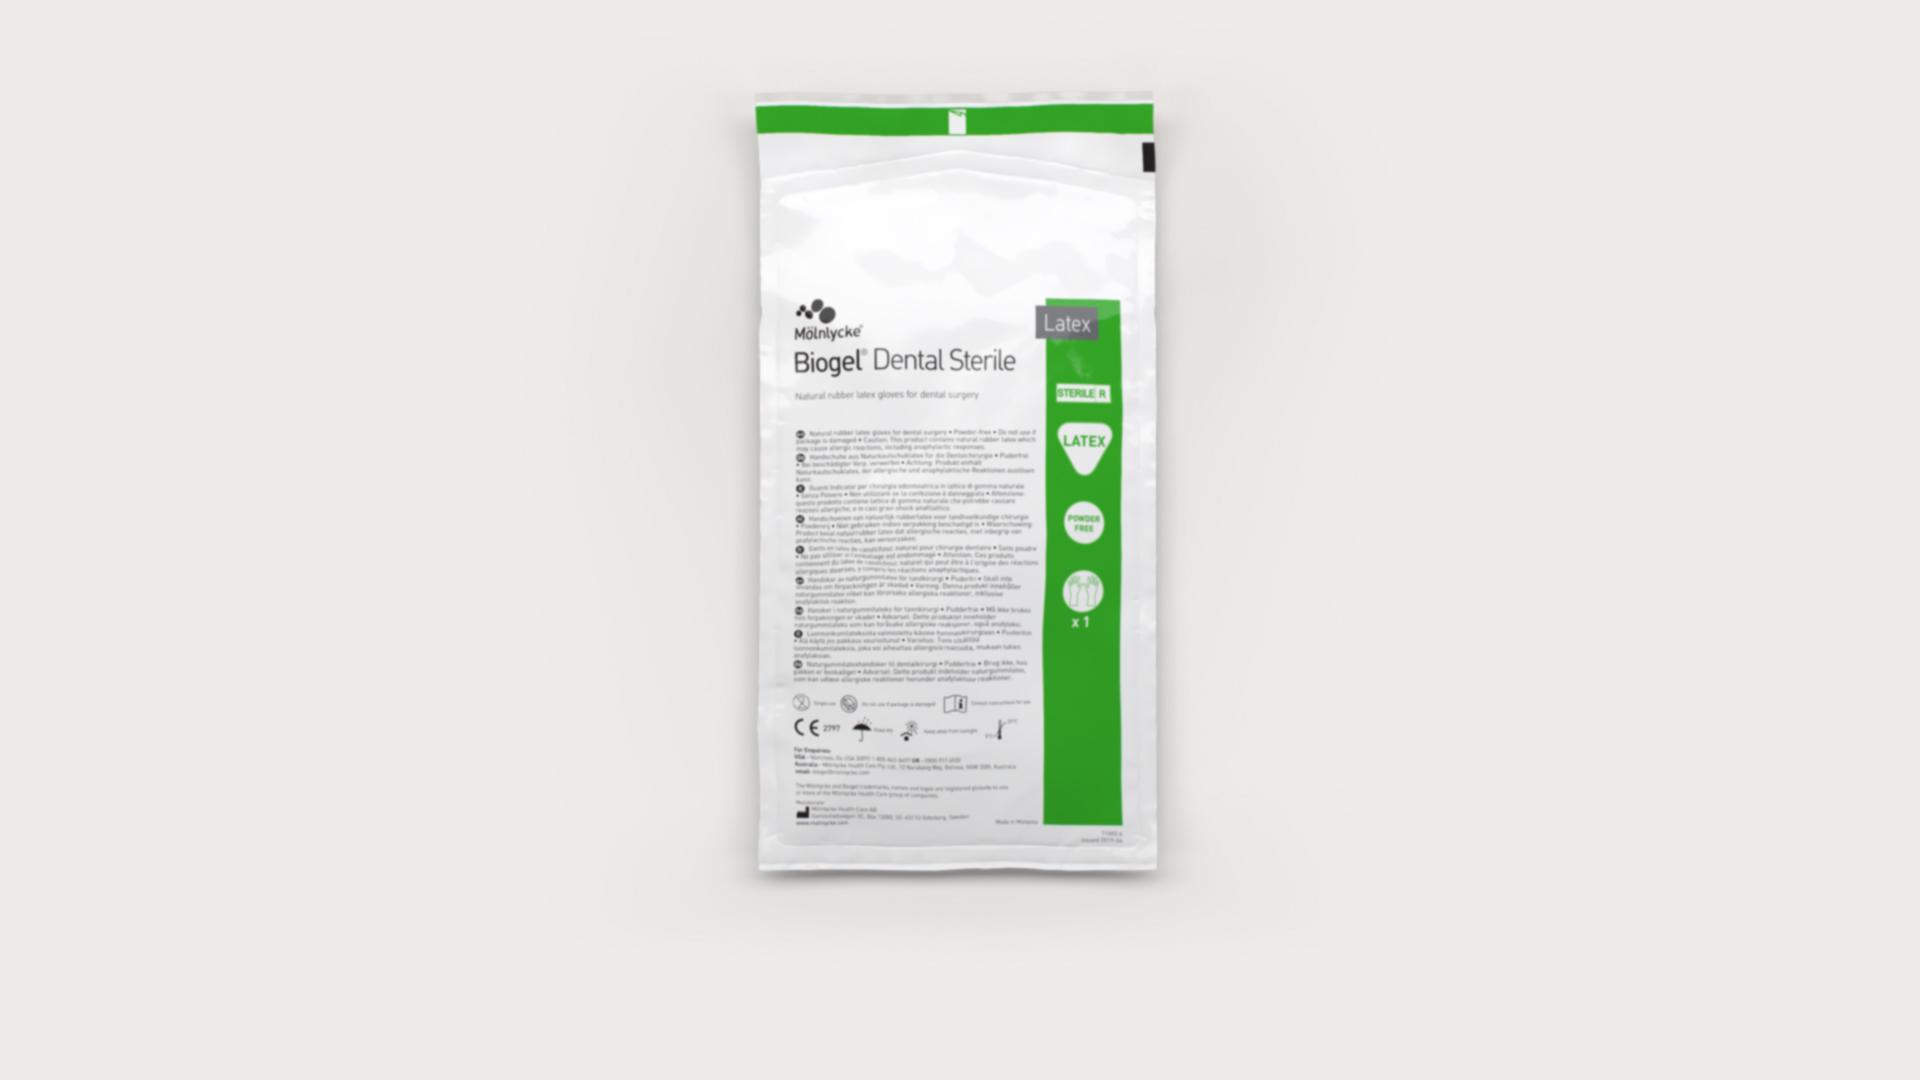 Biogel Dental Sterile natural rubber latex glove for dental